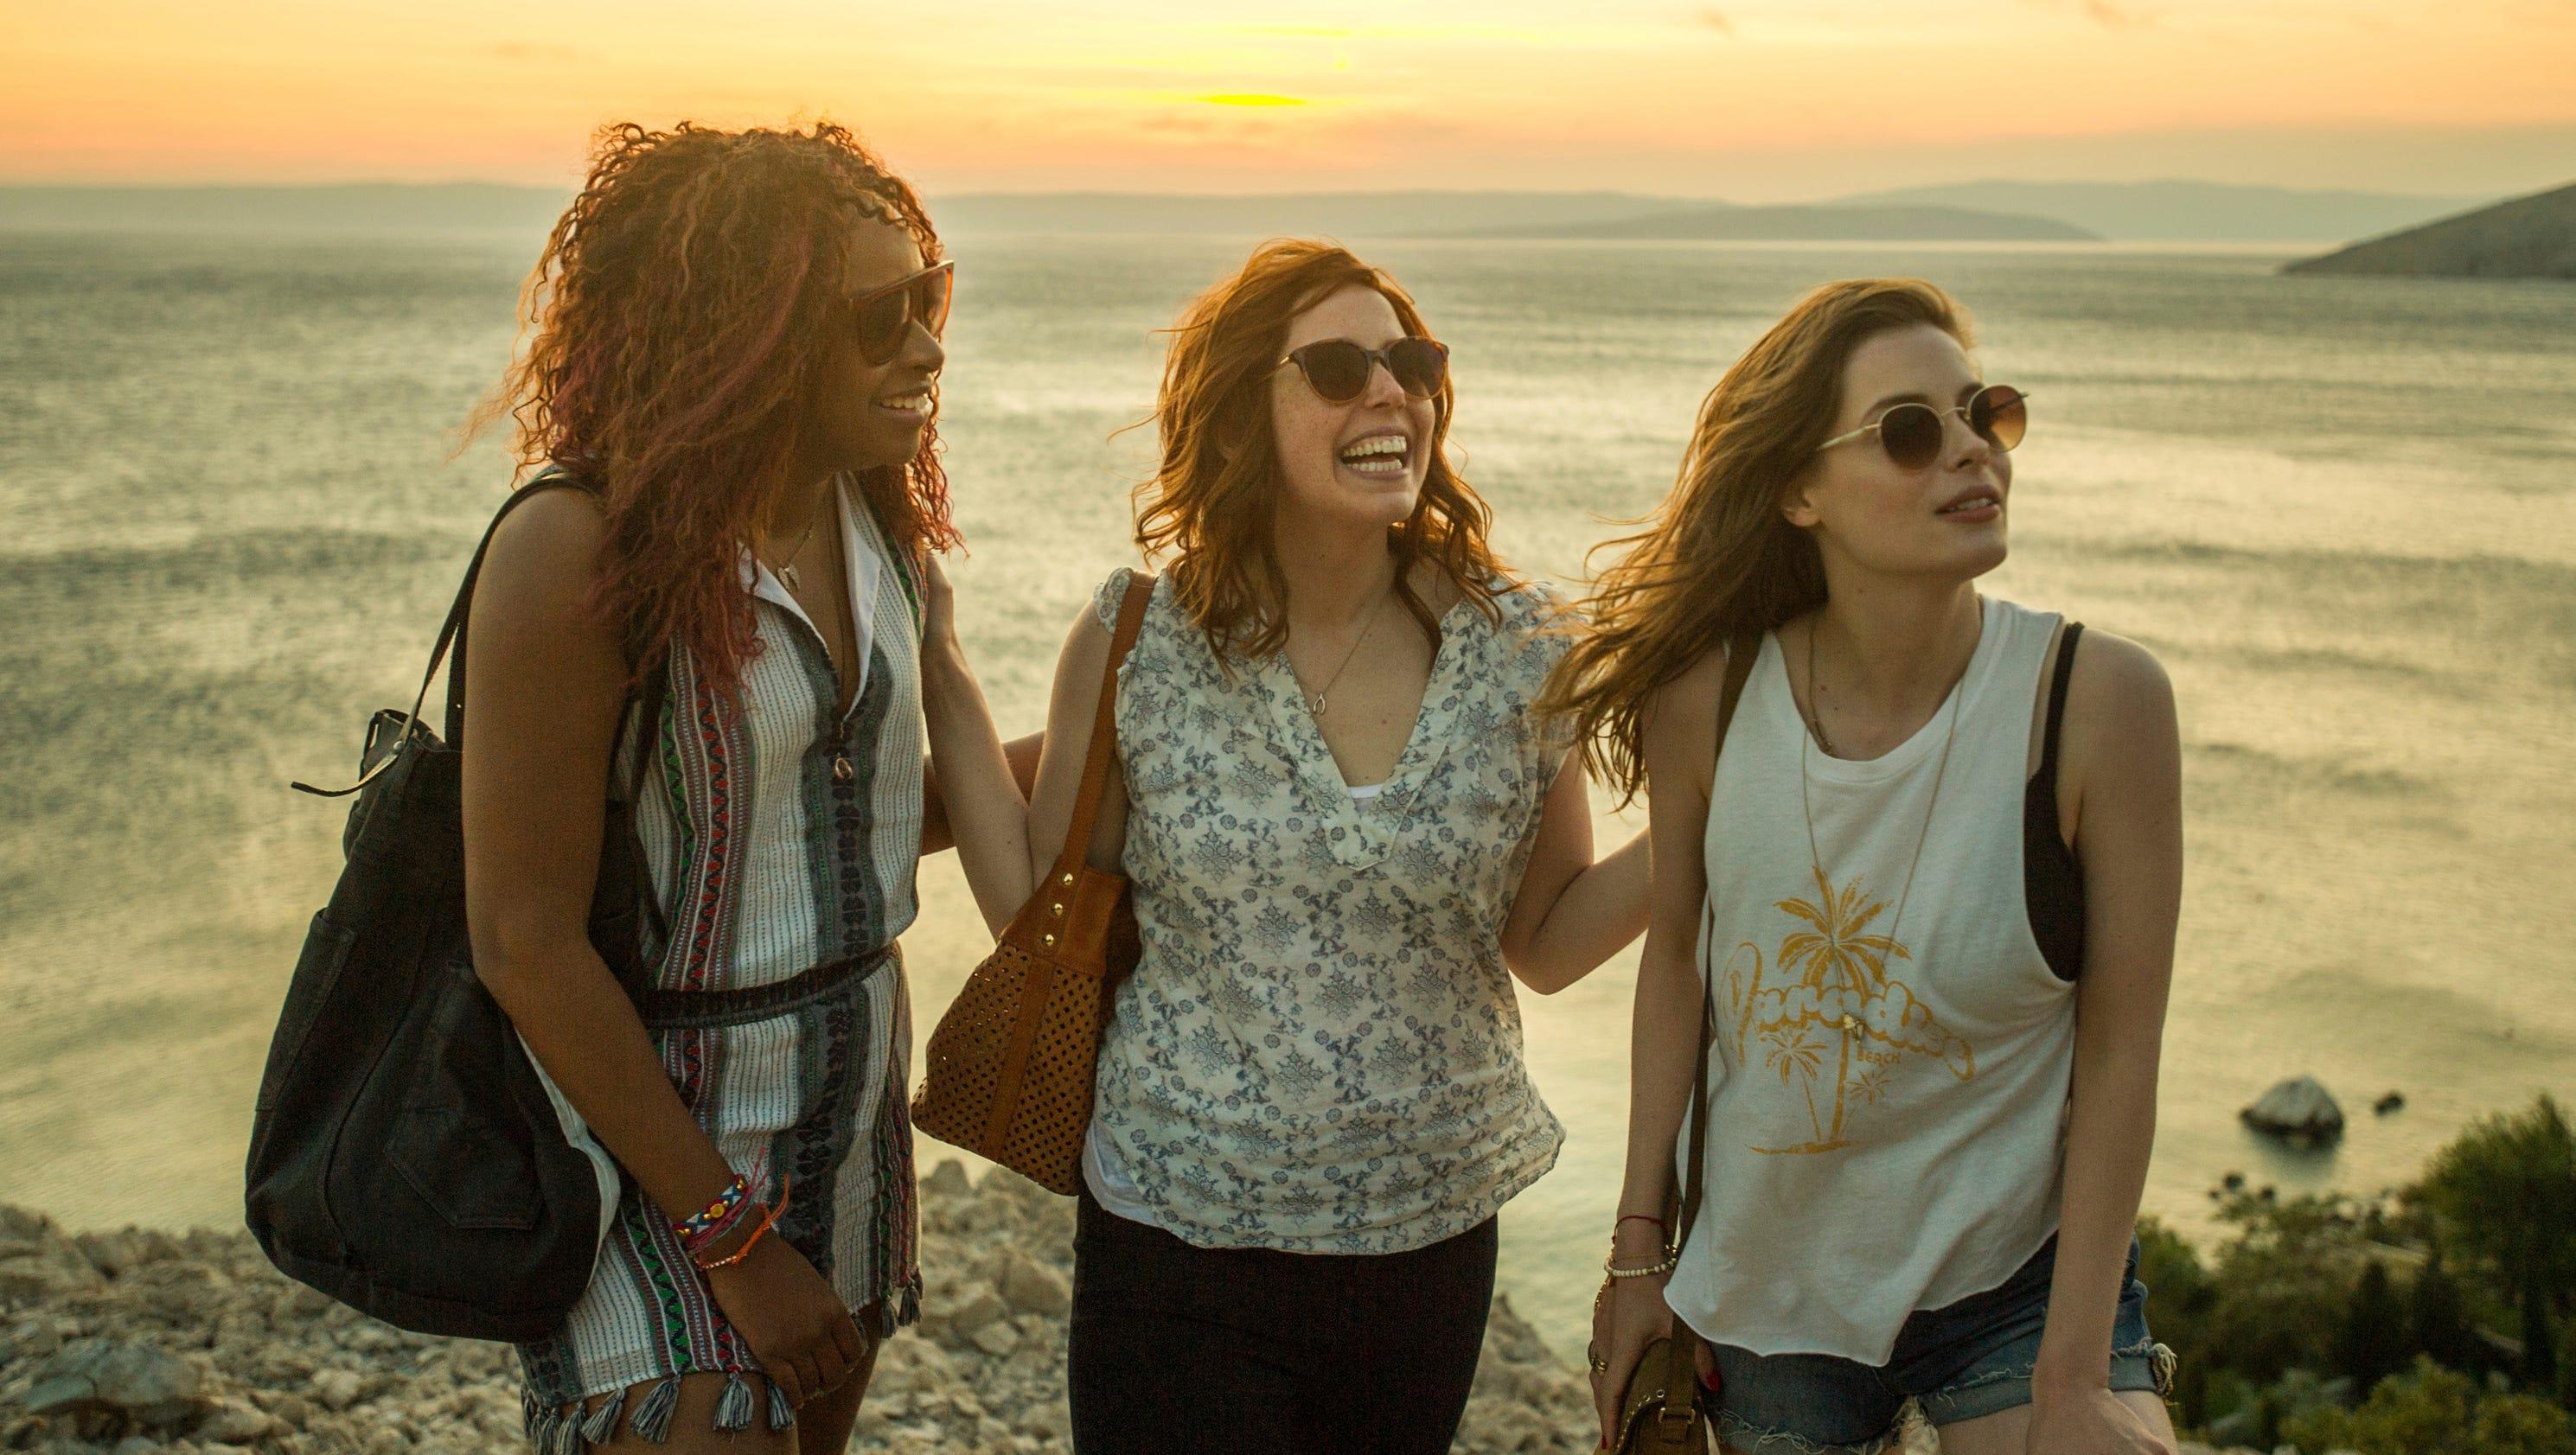 'Ibiza' is to Vanessa Bayer what 'Girls Trip' was to Tiffany Haddish